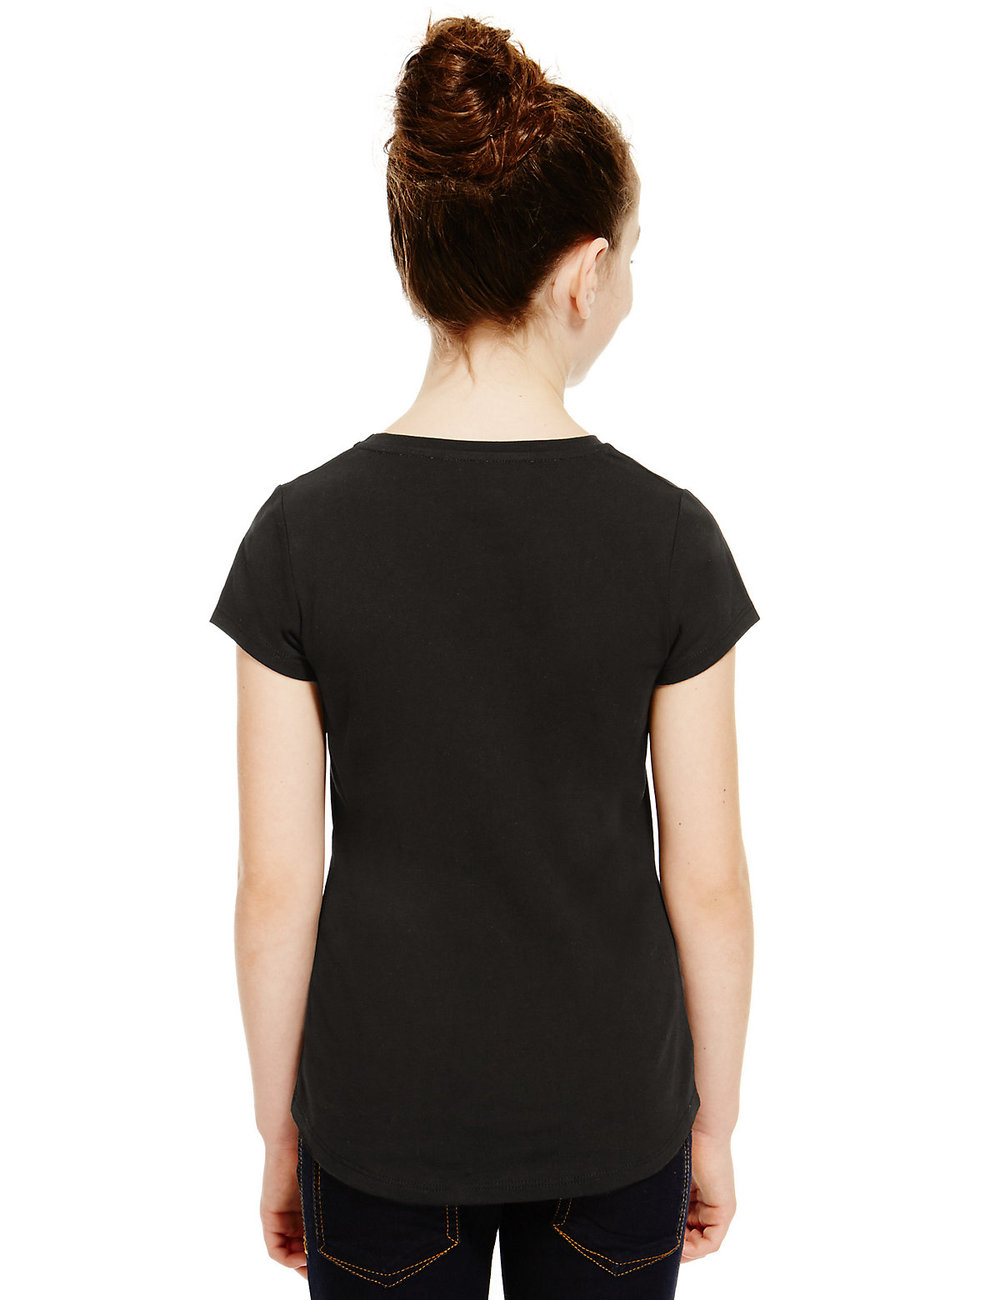 Shirt design for baby girl - Bulk Black Hot Drilling Design Baby Girls Cheap T Shirt Printing